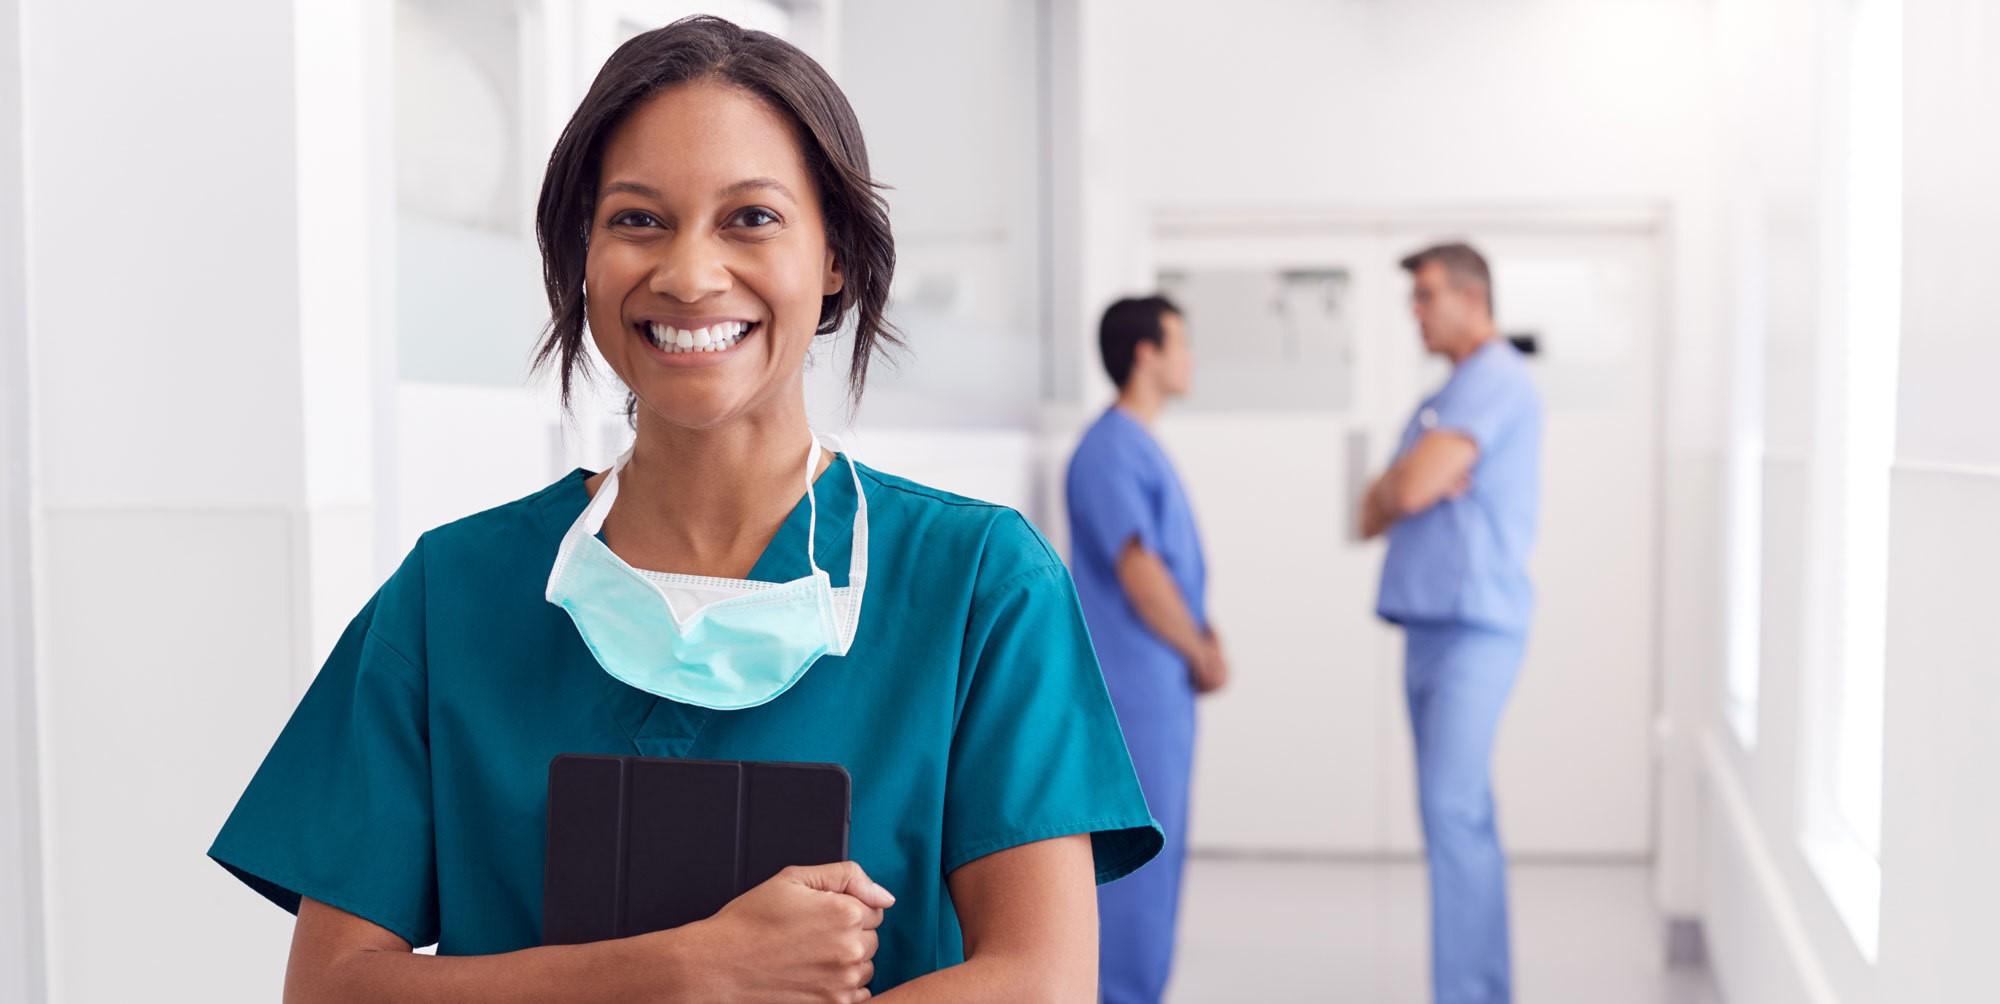 Medical Assisting Student Image - Swedish Institute - New York, NY